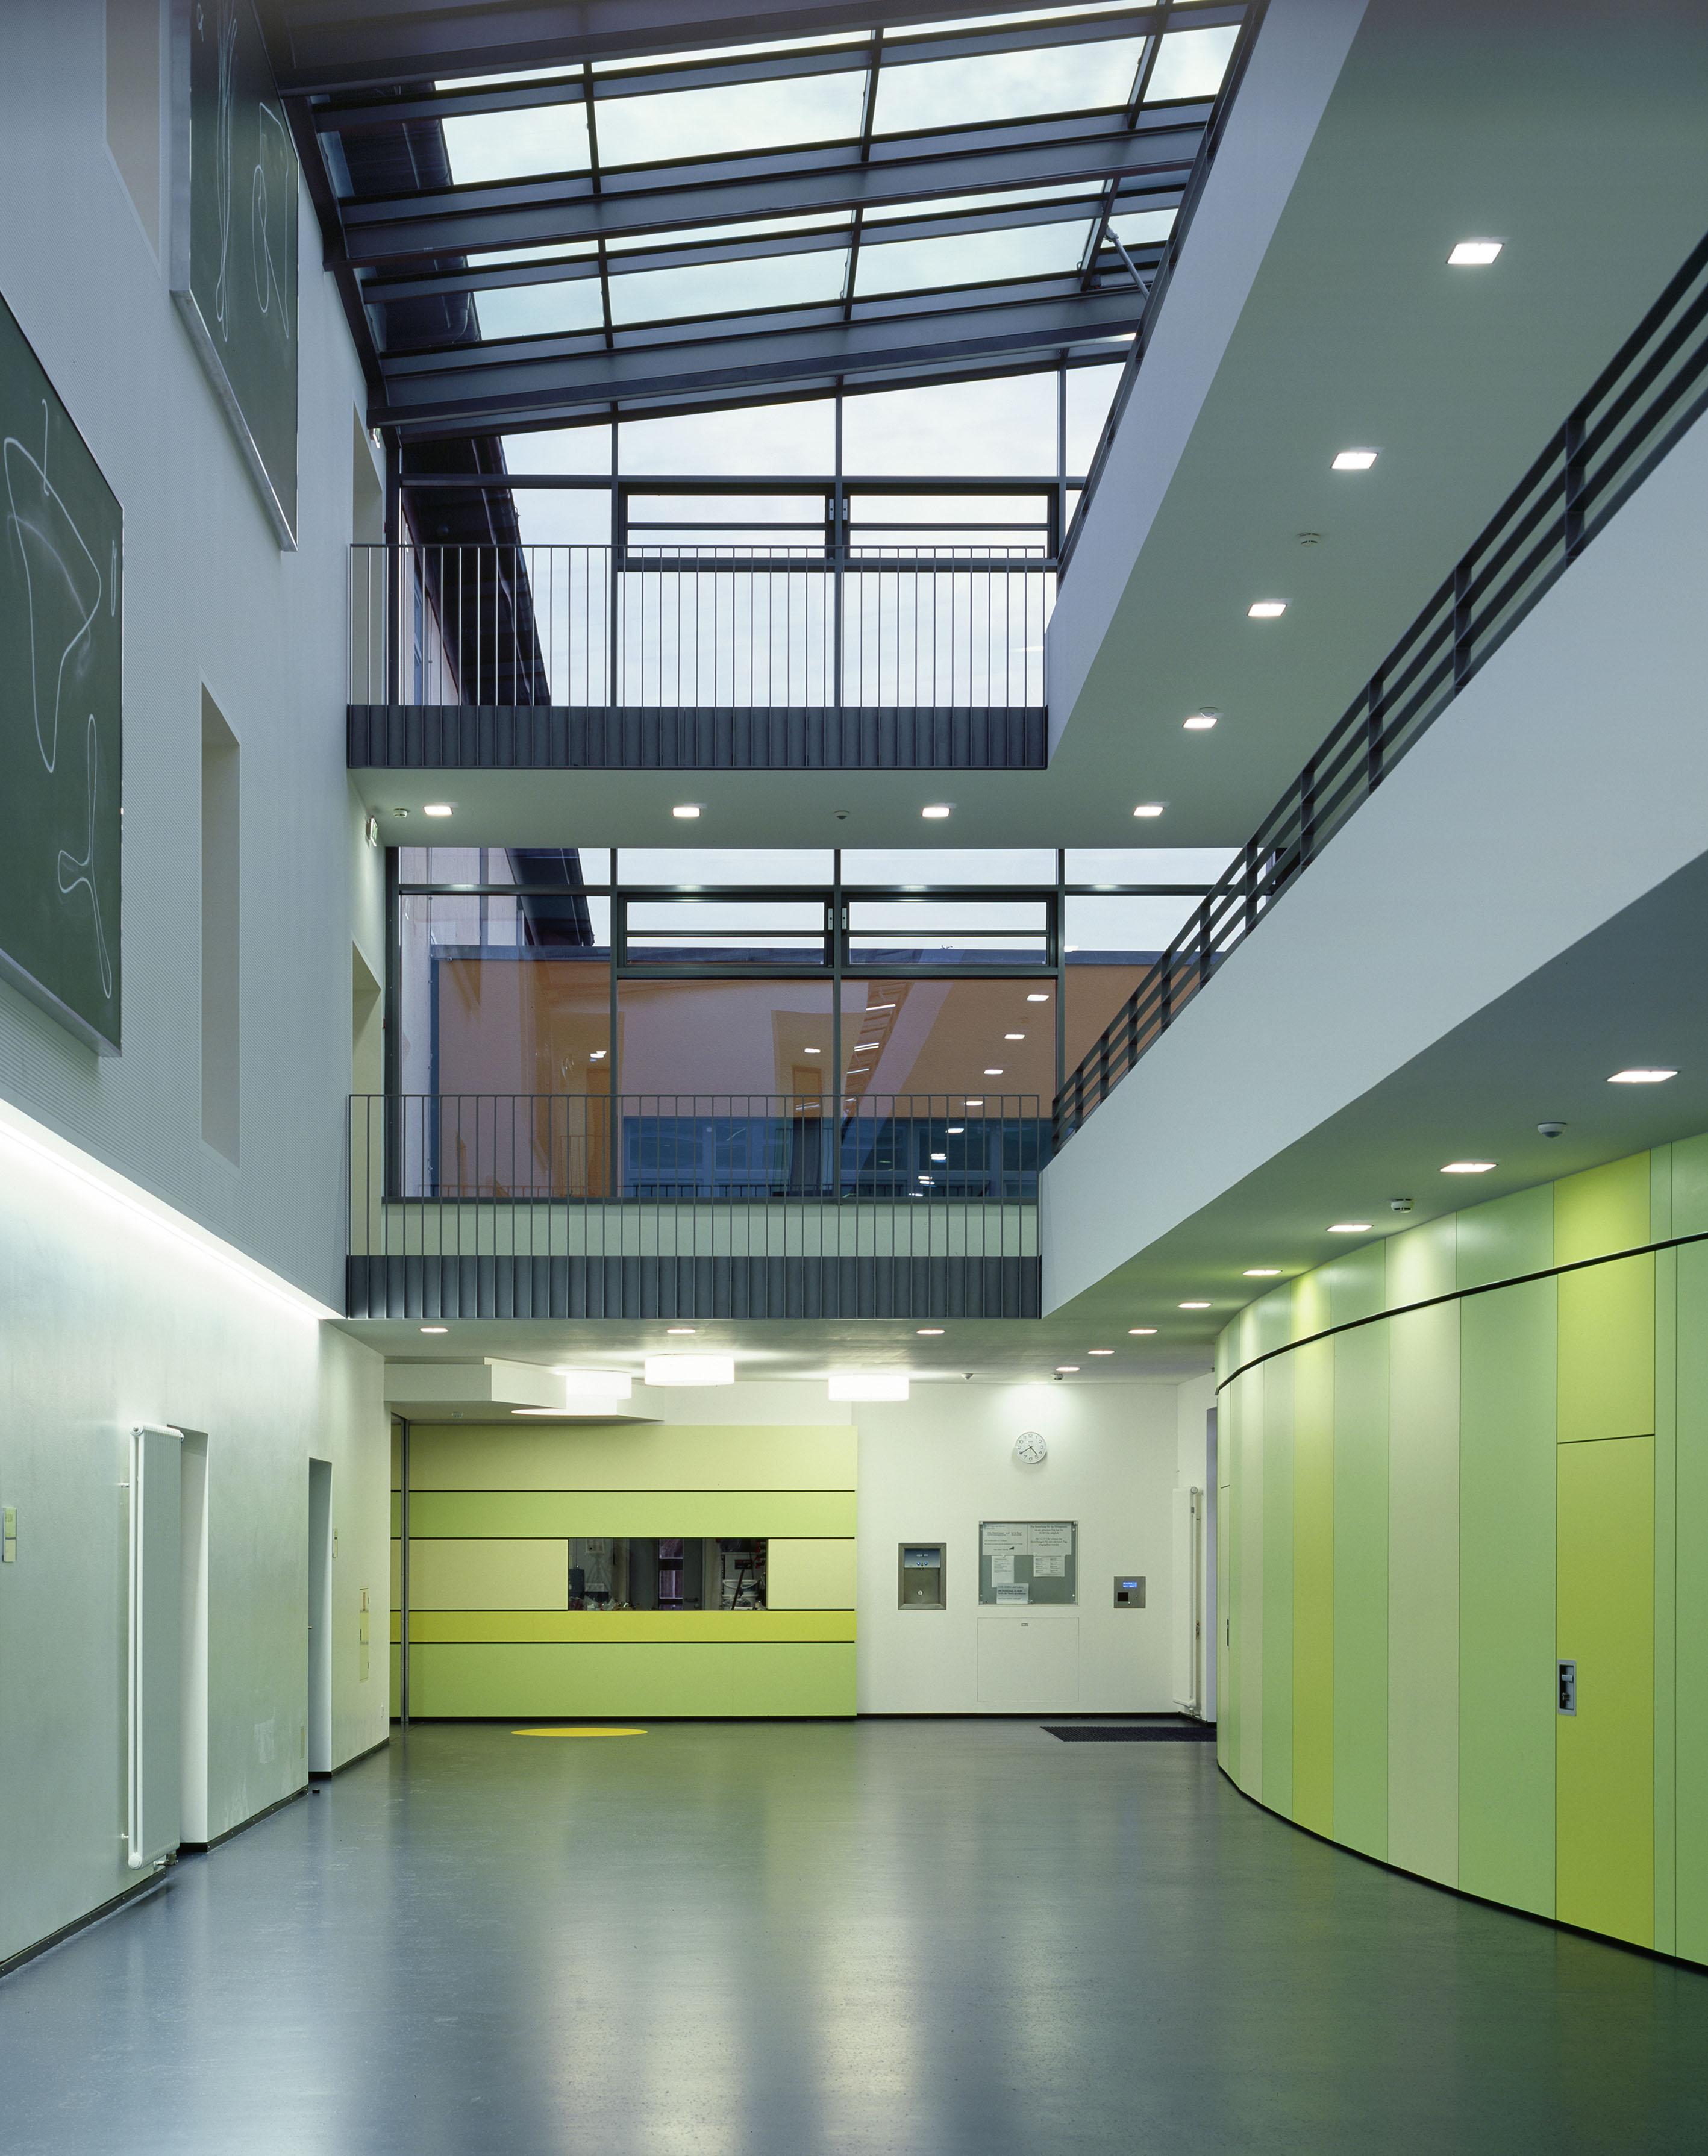 Amorbachschule_2047_16